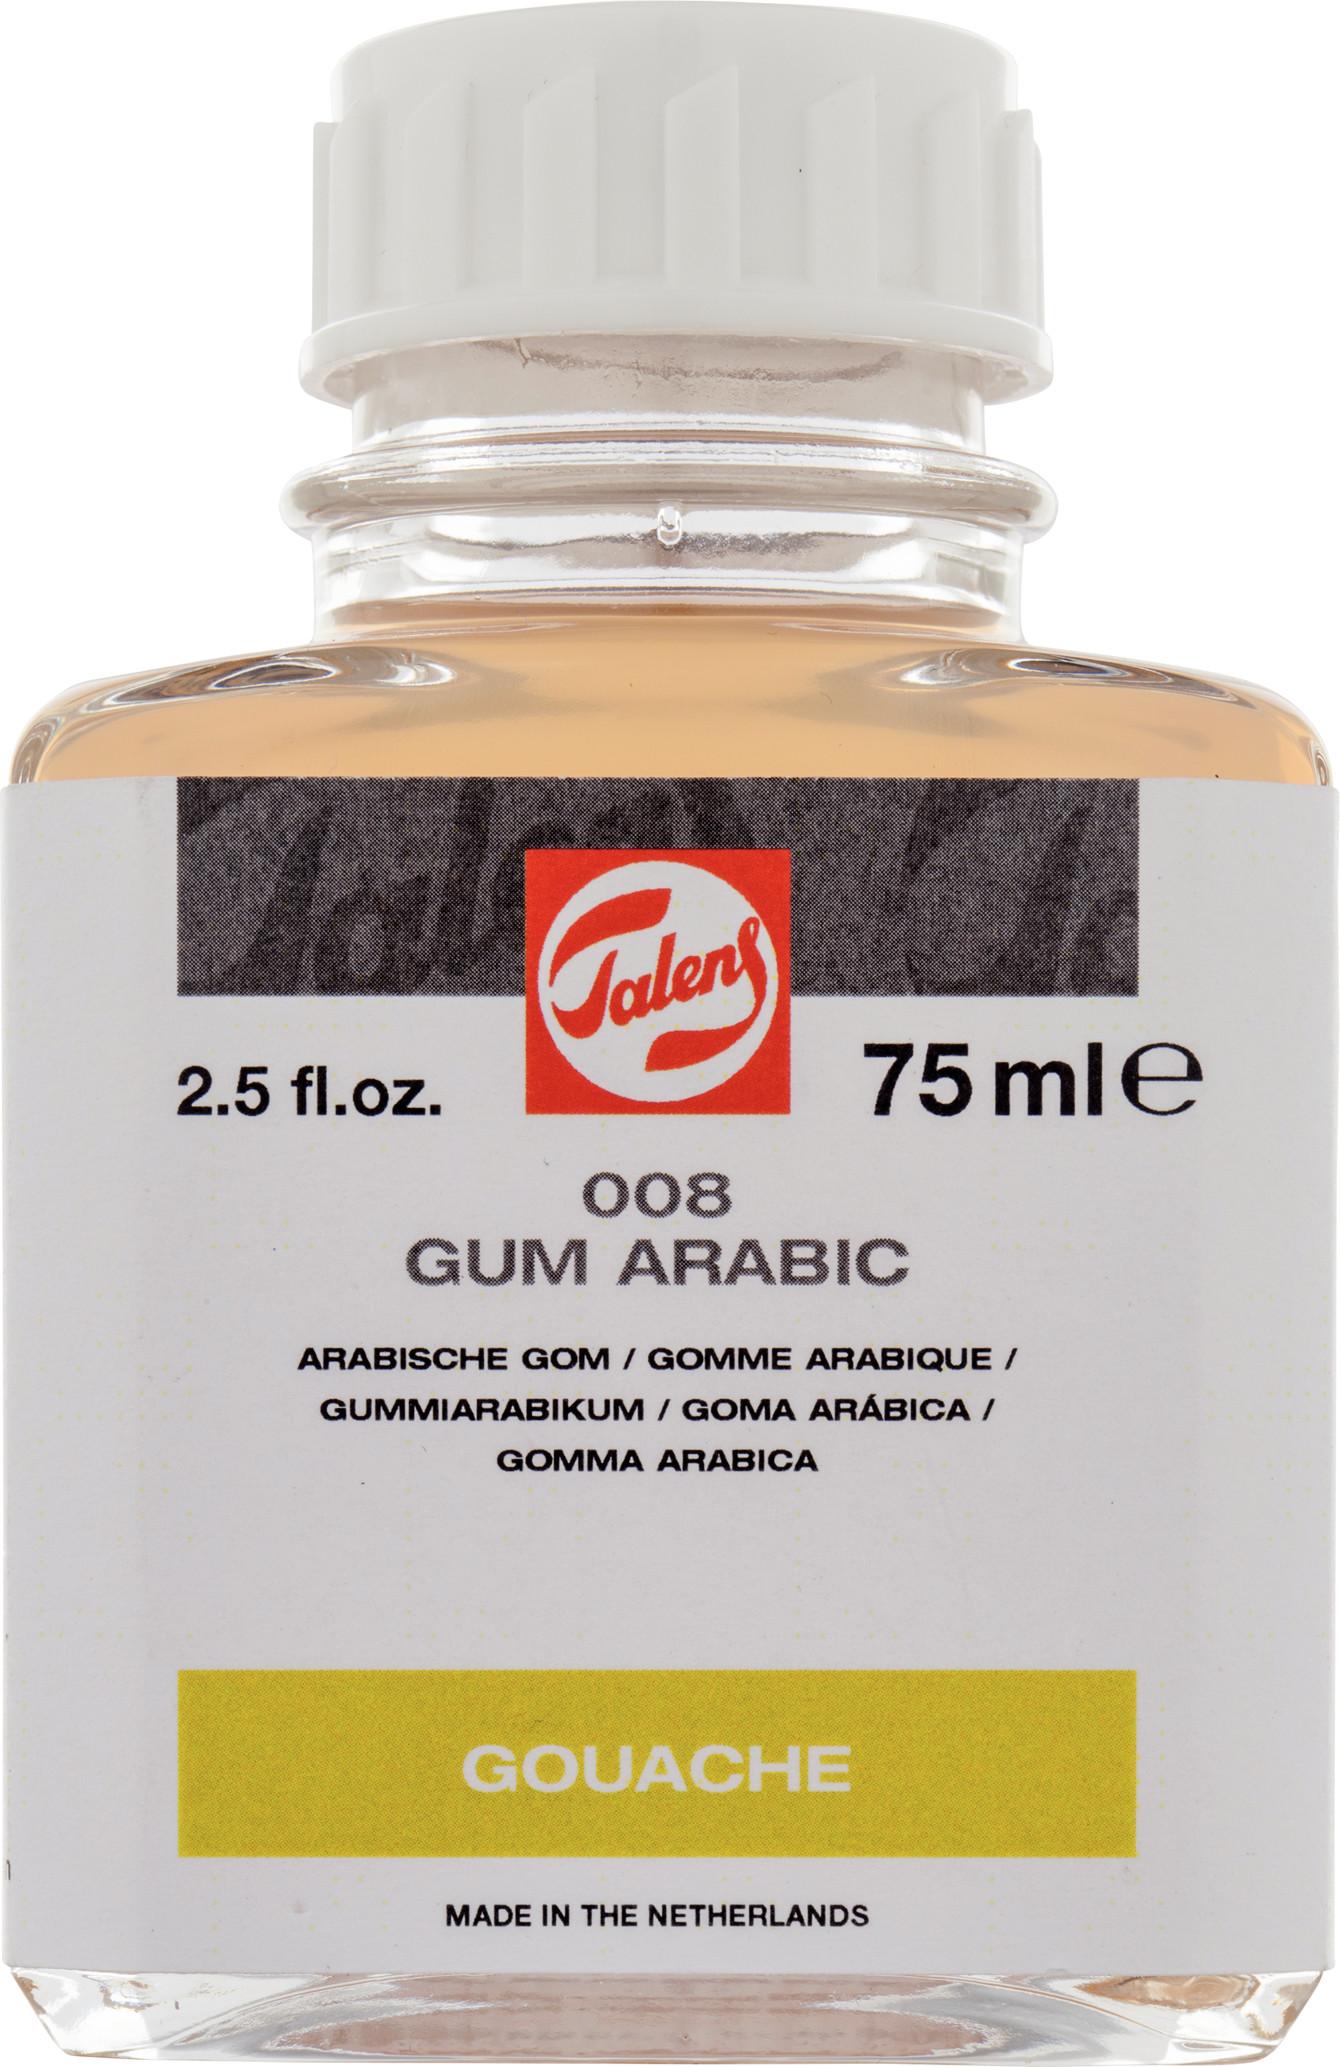 Gum Arabic Bottle 75 ml